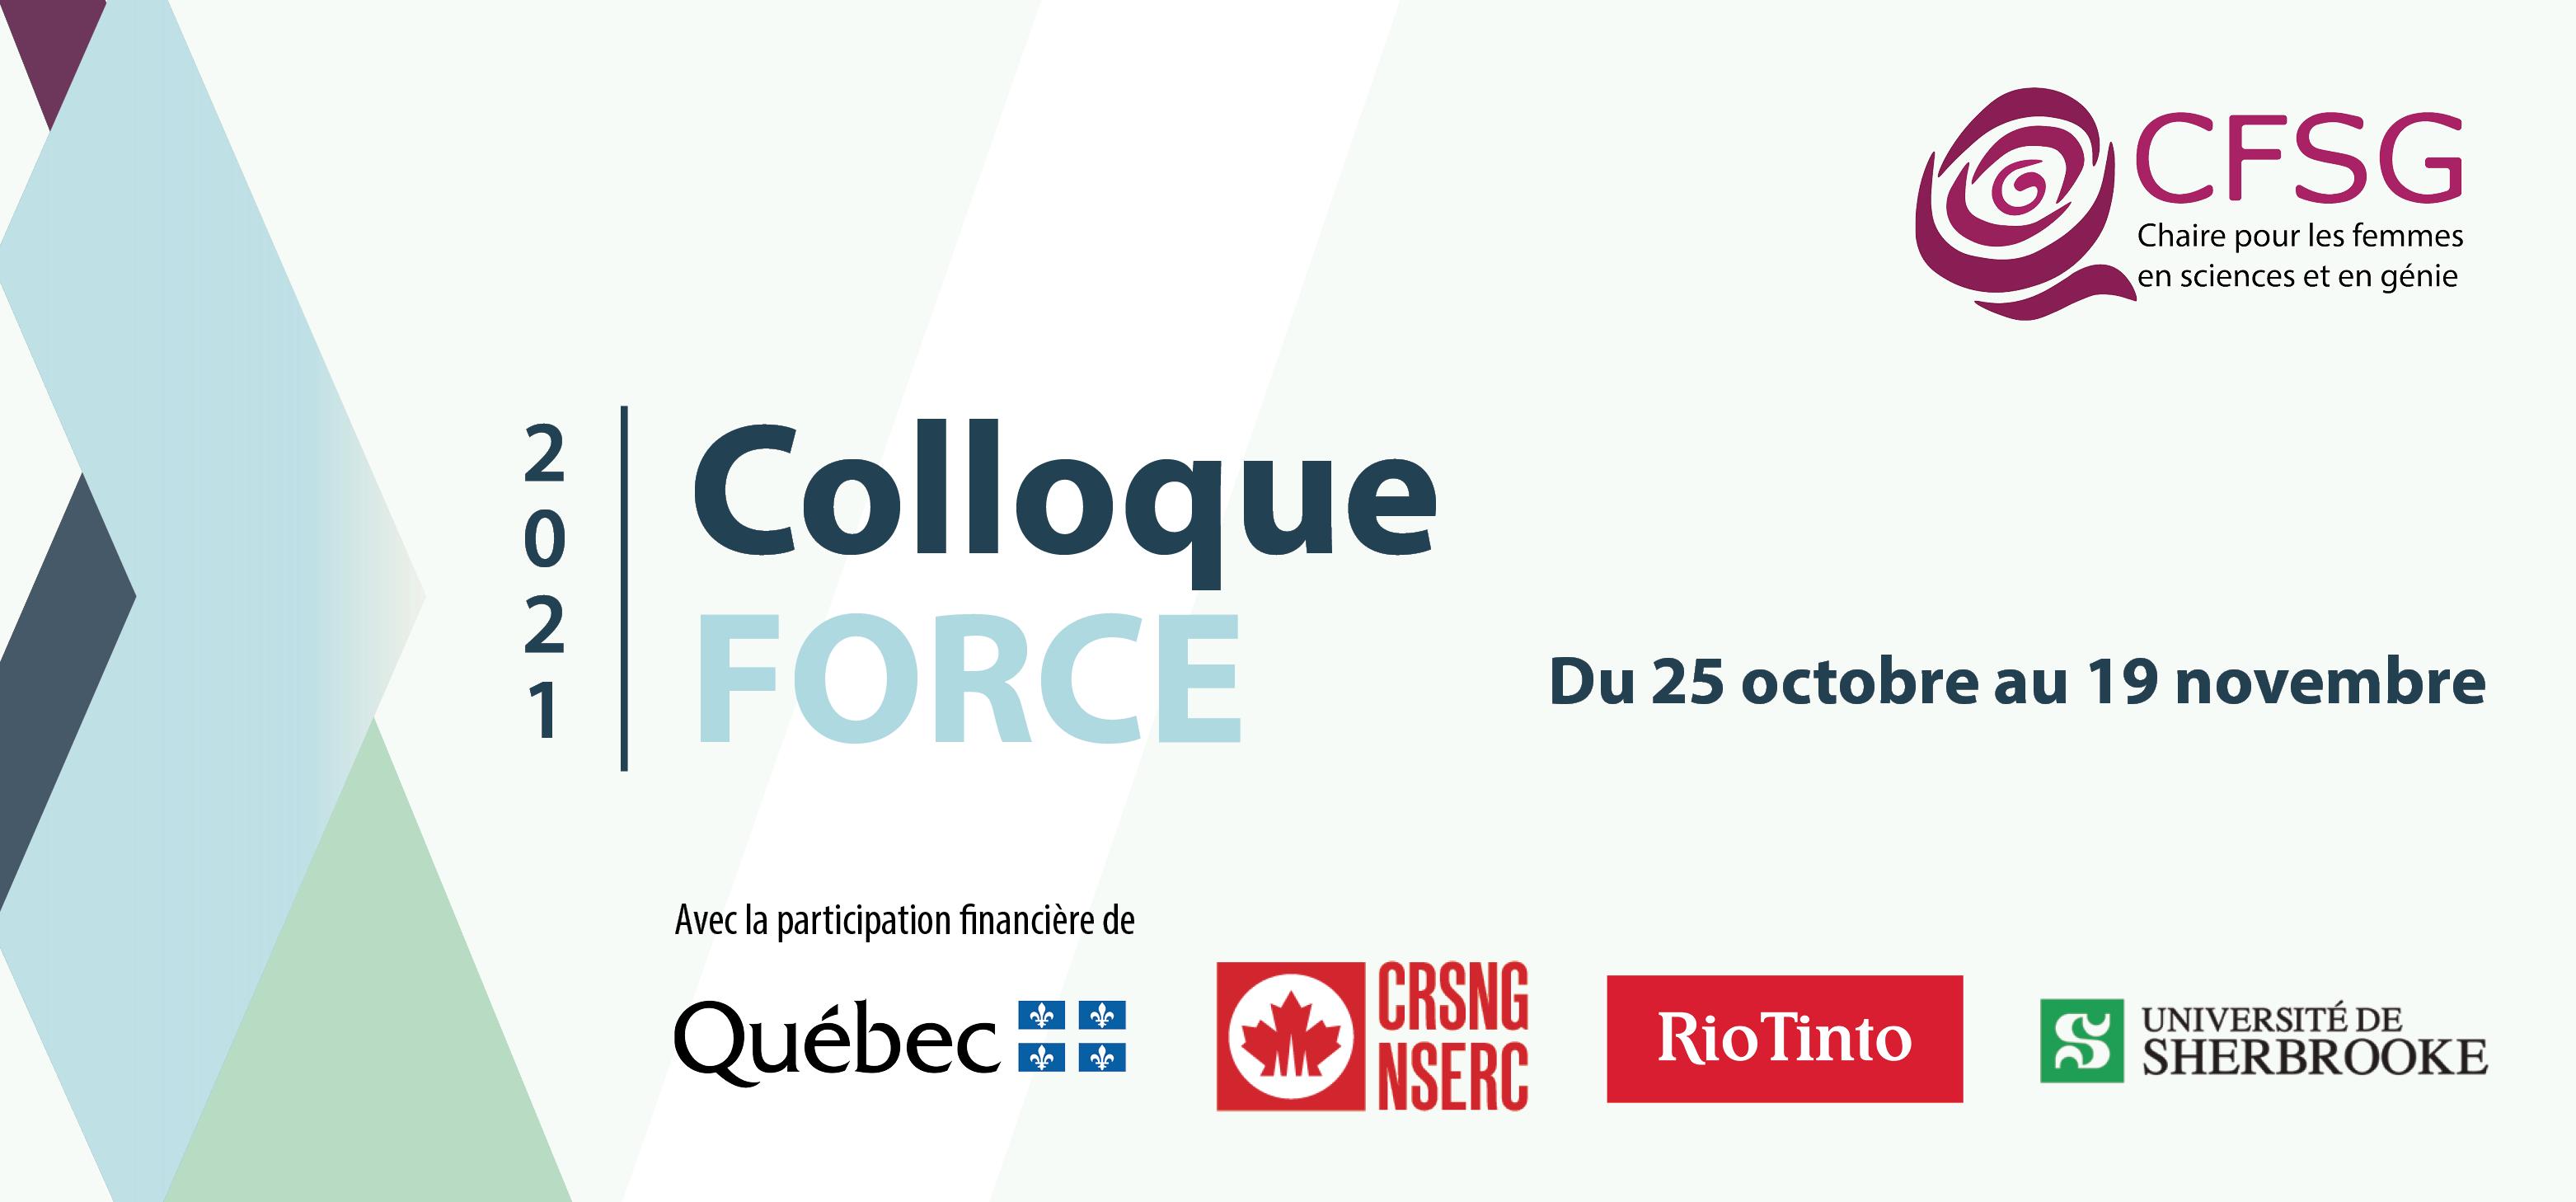 Colloque FORCE 2021 - Du 25 octobre au 19 novembre